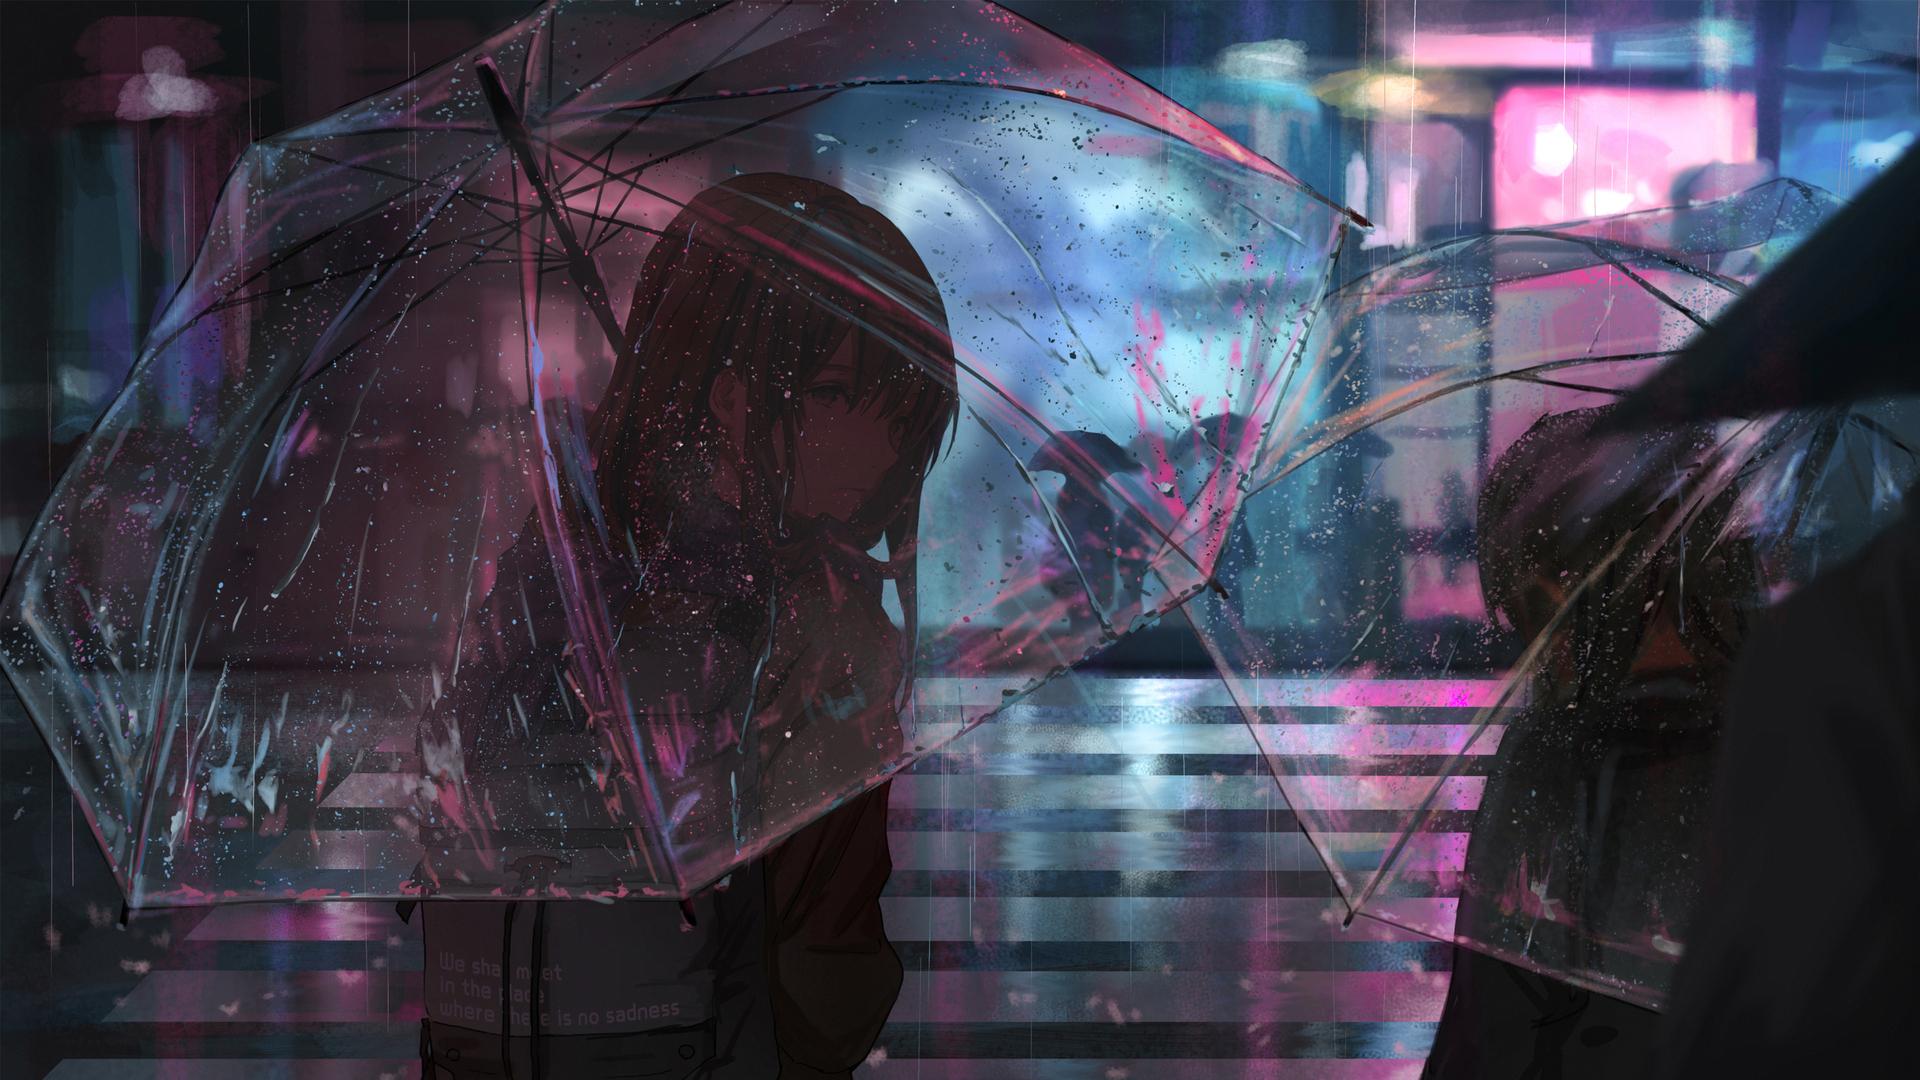 1400x900 Girl Wallpaper 1920x1080 Anime Girl In Rain With Umbrella 4k Laptop Full